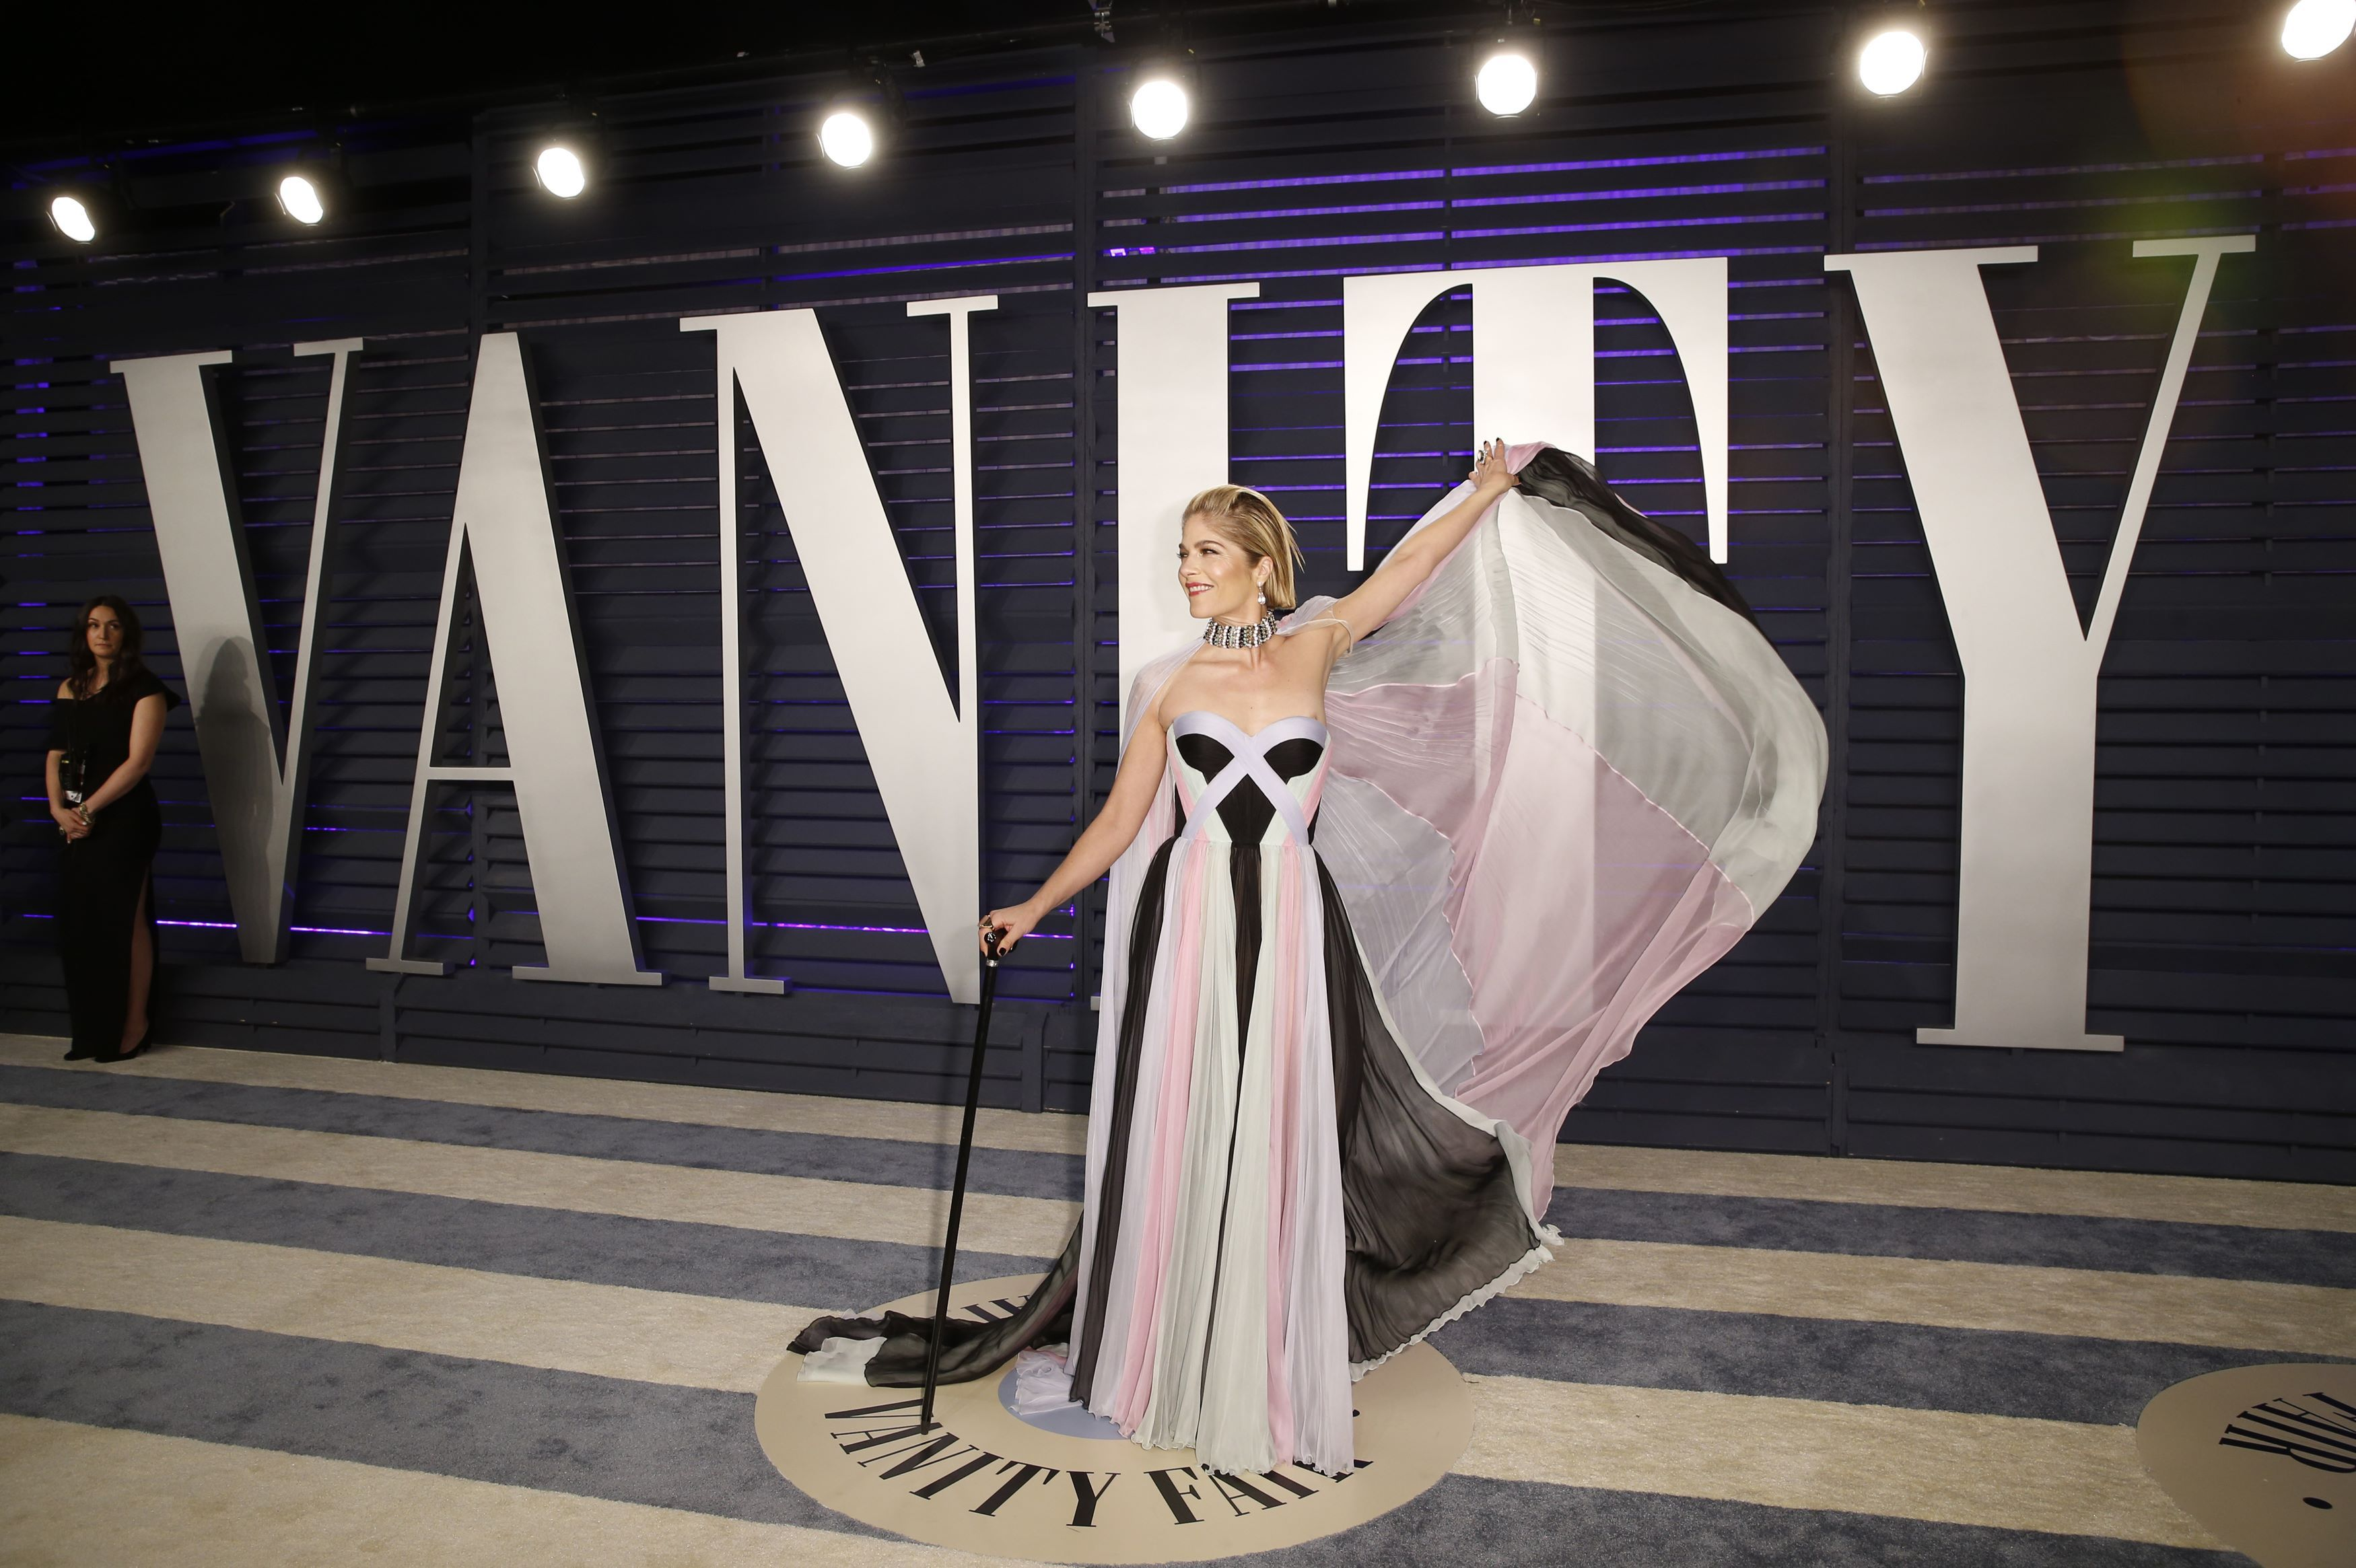 Glumica Selma Blair na Vanity Fair tulum došla sa štapom i pokazala kakav je borac!